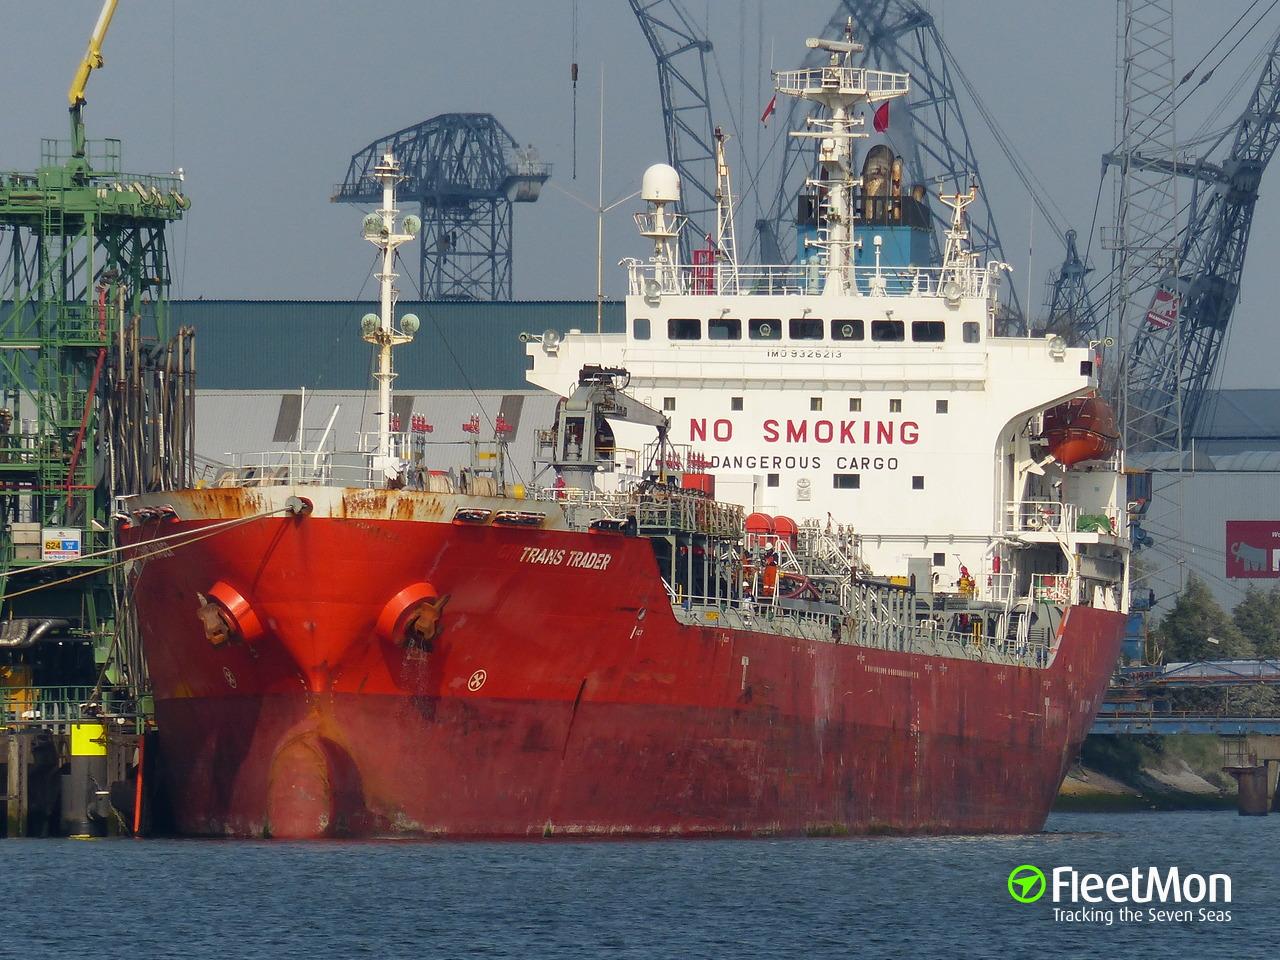 Vessel GC SINGAPORE (Oil tanker) IMO 9326213, MMSI 564270000